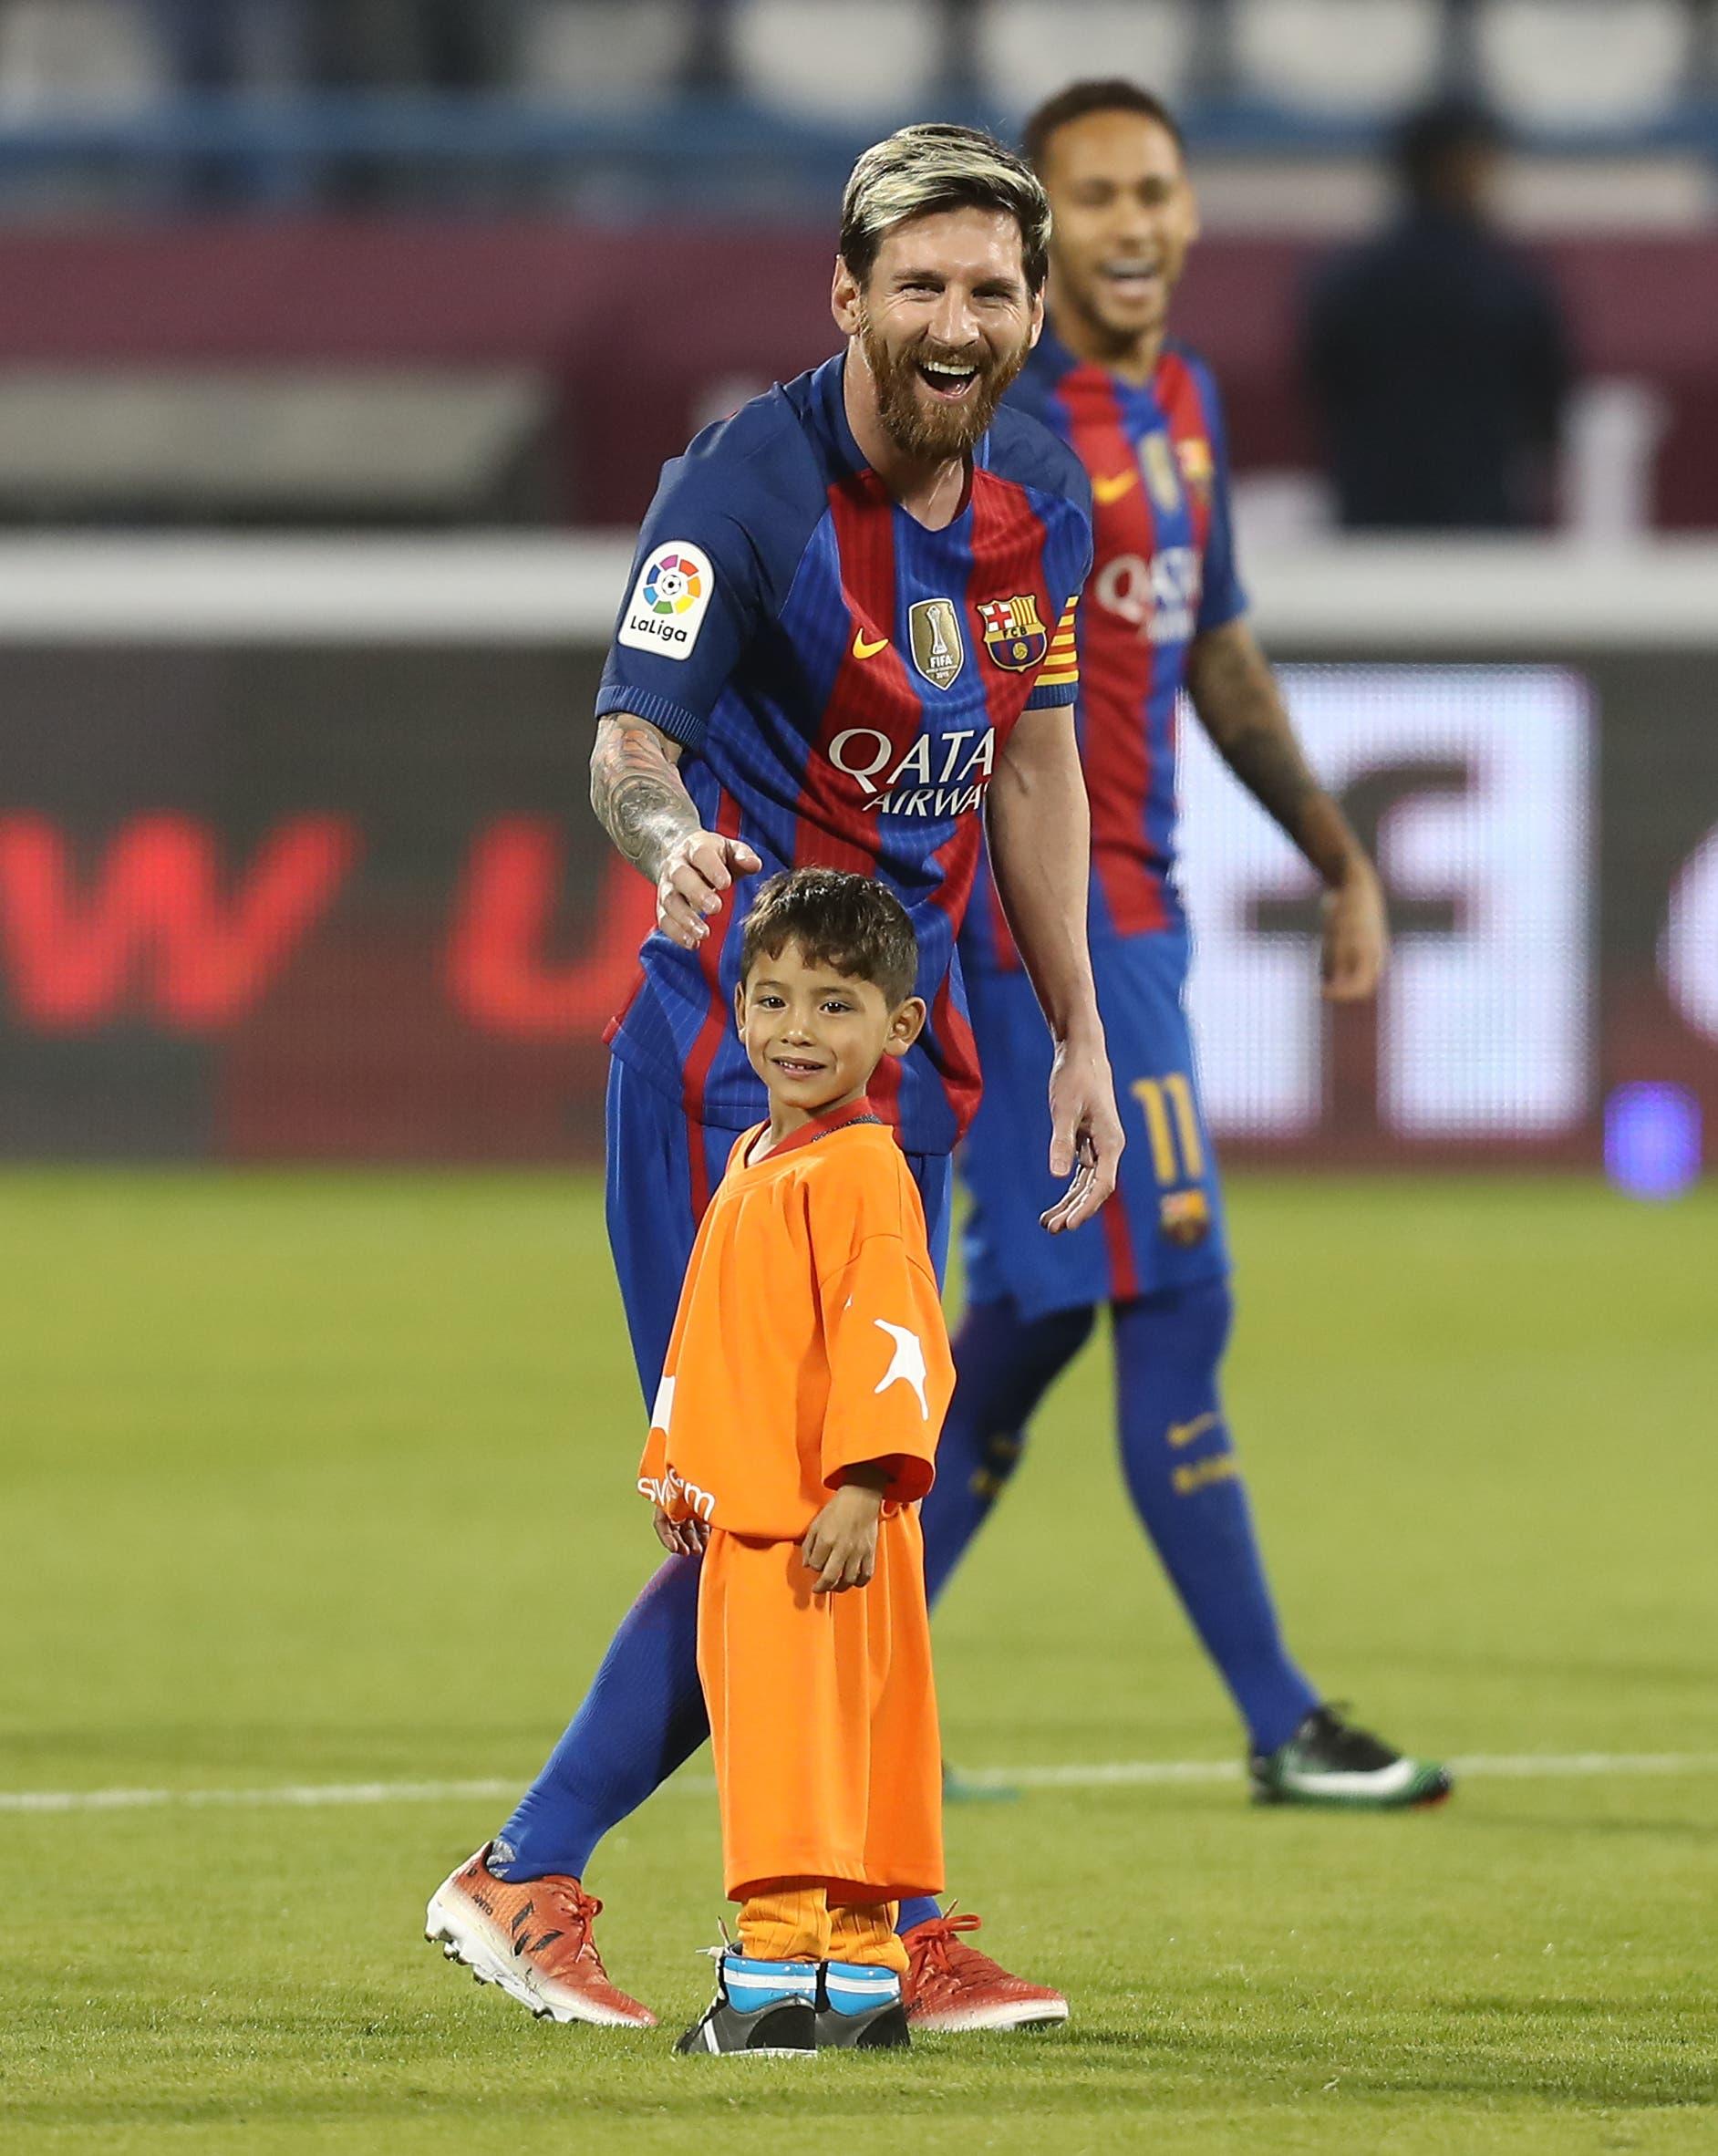 FC Barcelona Lionel Messi talks to Afghan boy Murtaza Ahmadi on the pitch before the start of a friendly football match against Saudi Arabia's Al-Ahli FC on December 13, 2016 in the Qatari capital Doha. (AFP)